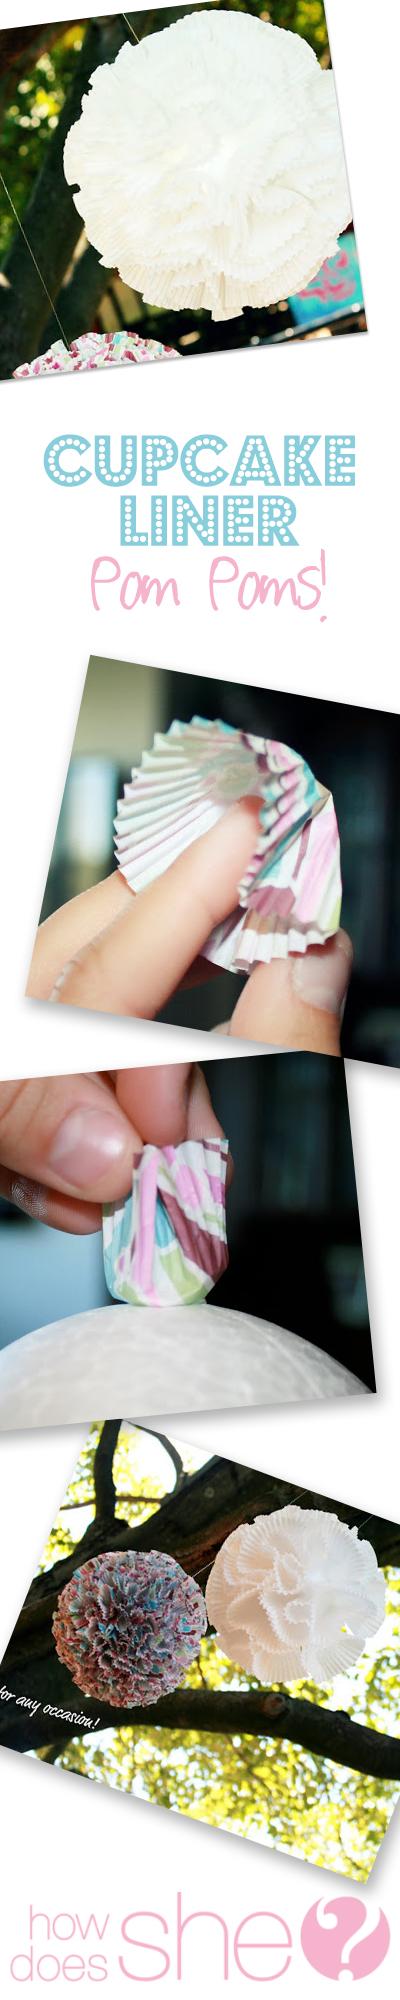 cupcake liner pom pom tutorial